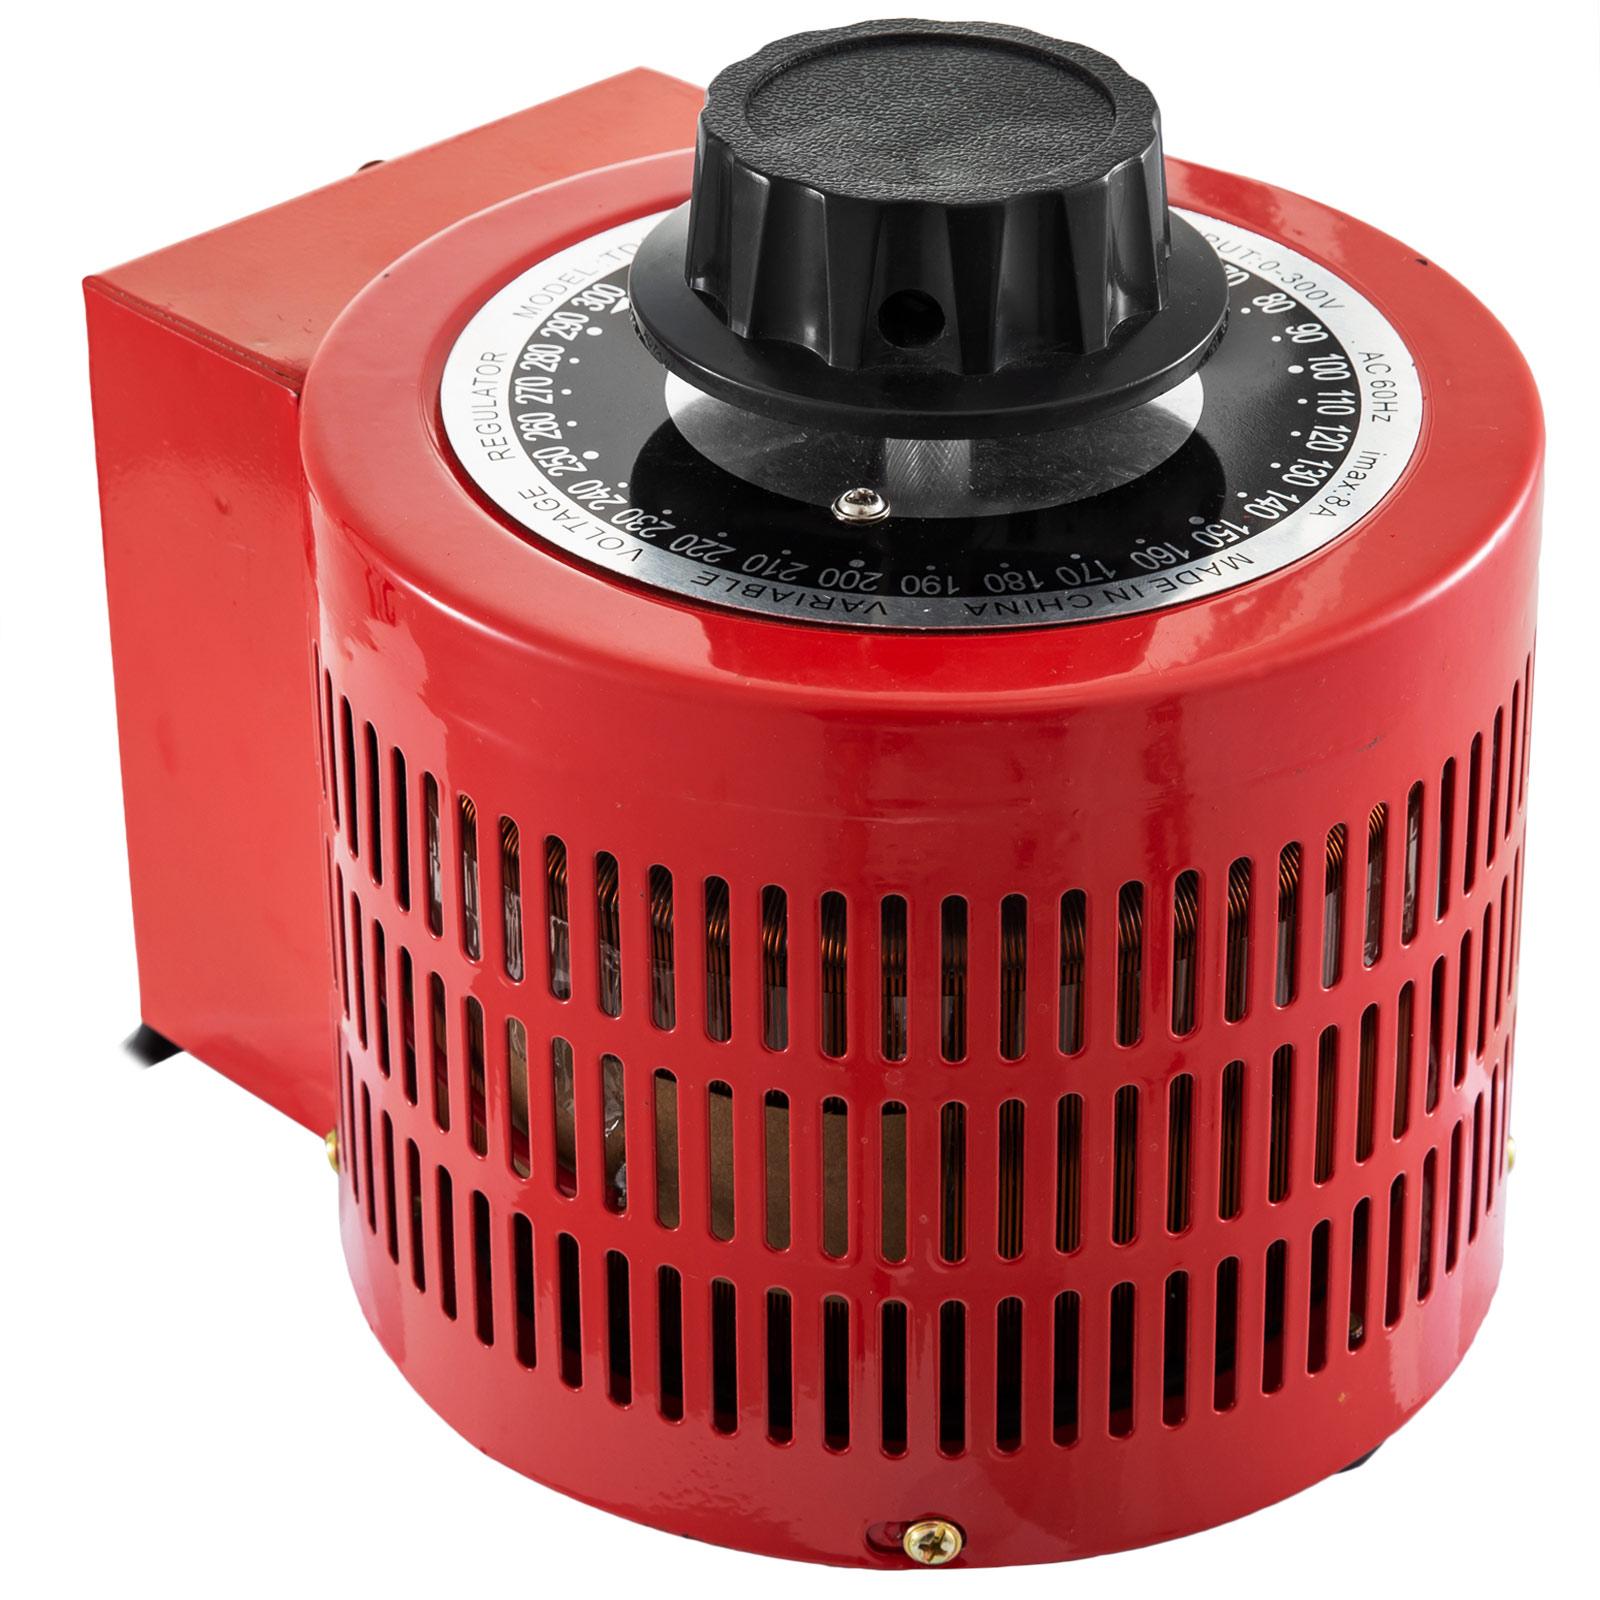 Auto-Variac-Variable-Transformer-0-5-1-2-3KVA-Regulator-pure-copper-coil-220V thumbnail 46